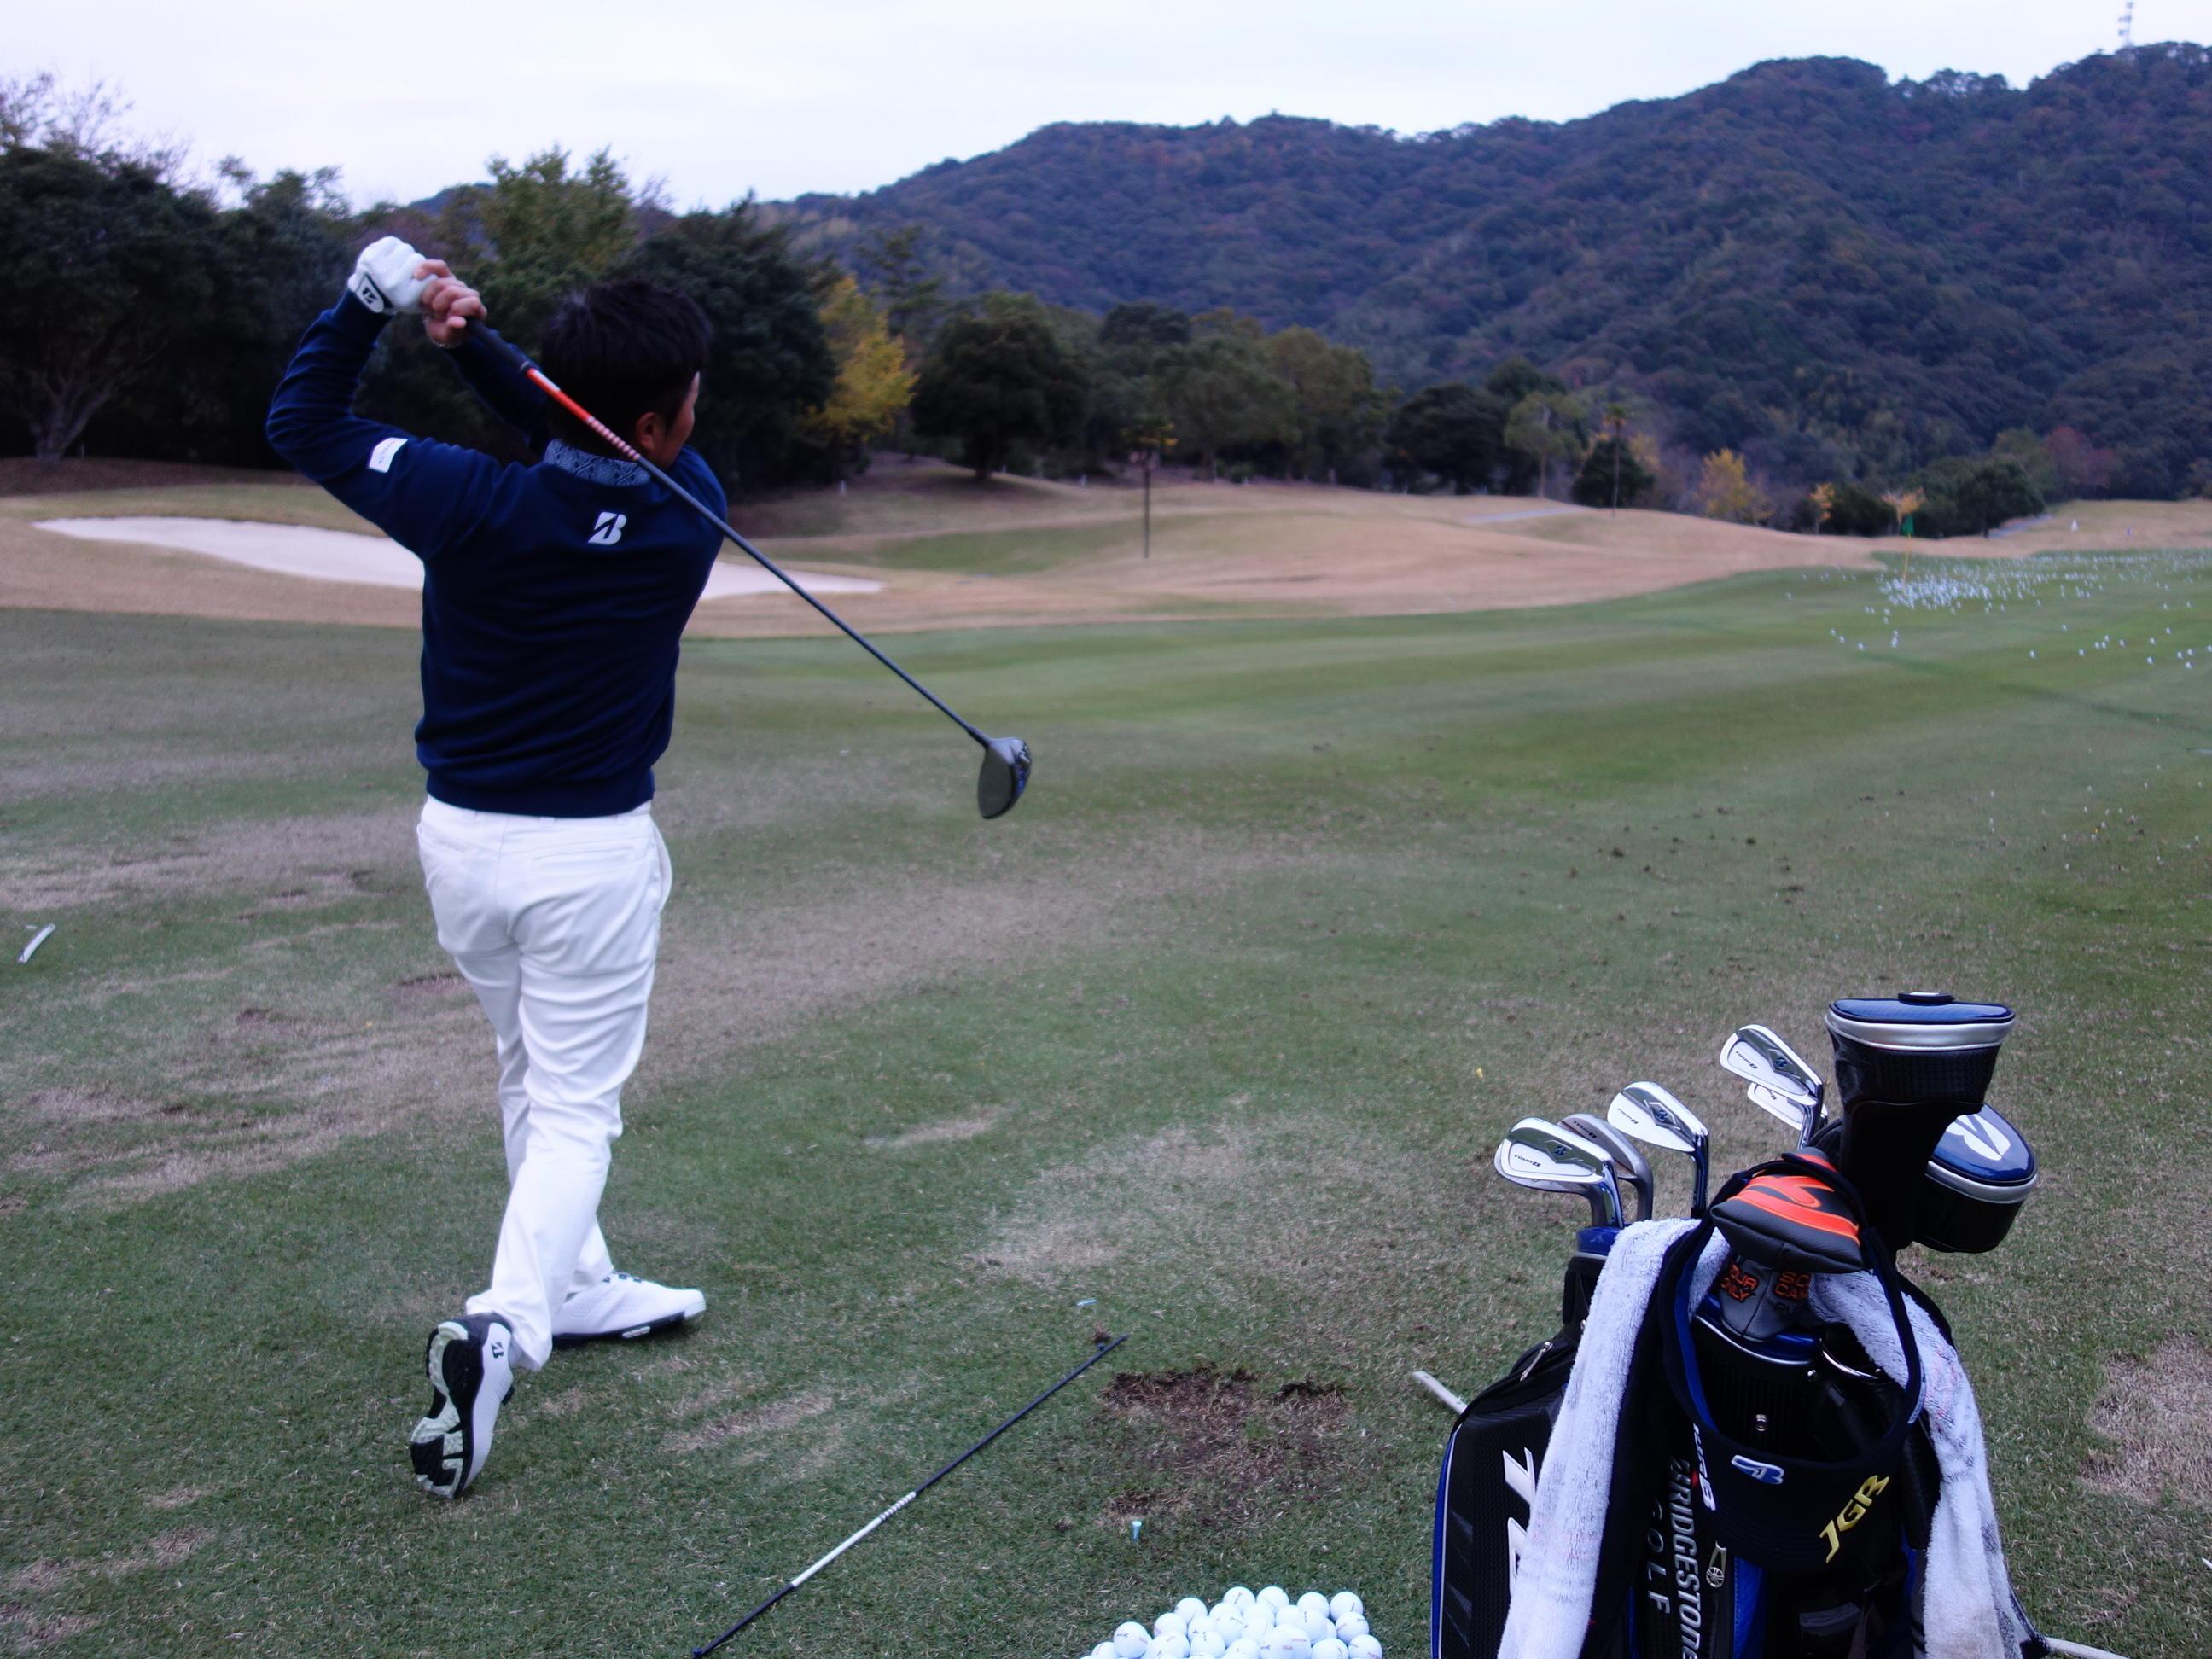 http://www.bs-golf.com/pro/53a6c9750762ab6752a0638987efed1d38ab733a.JPG